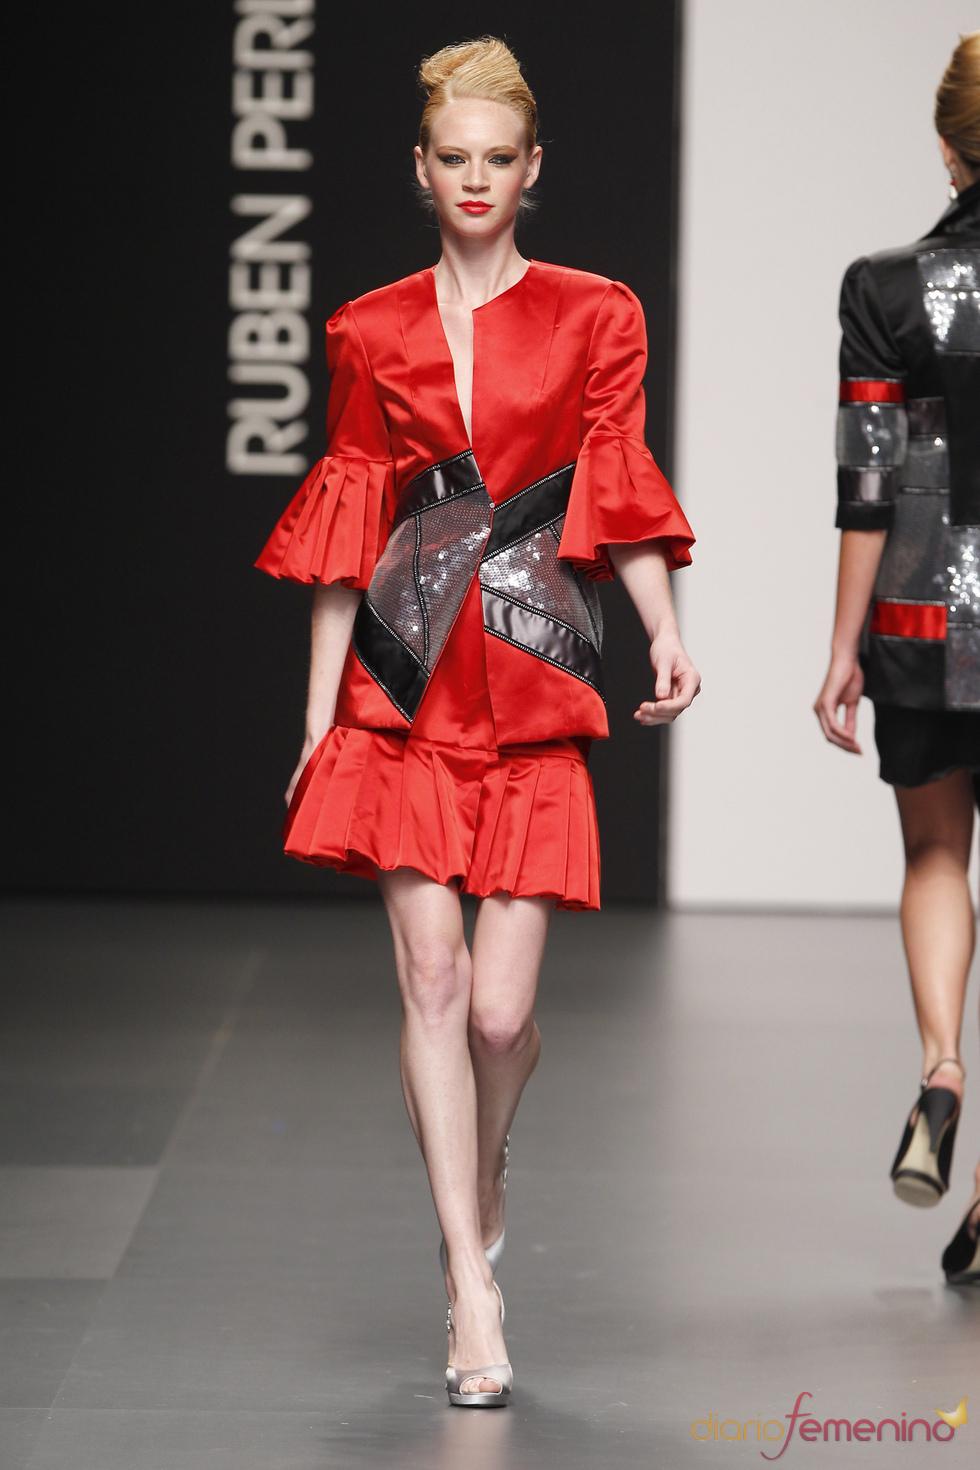 Original vestido de fiesta de Rubén Perlotti